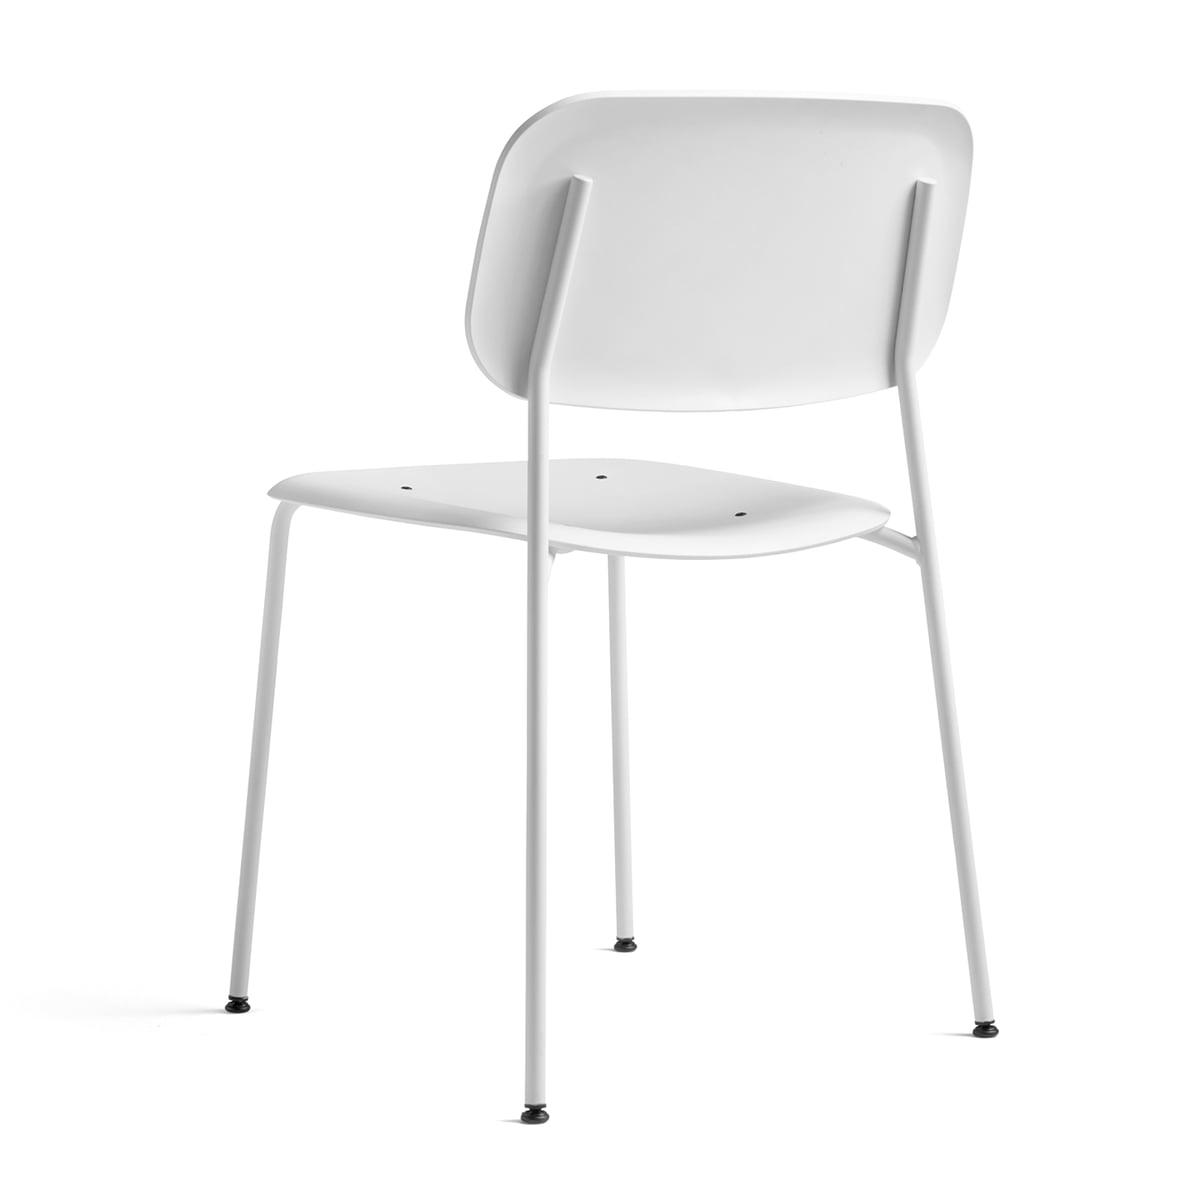 Elegant Hay   Soft Edge P10 Stuhl, Weiß